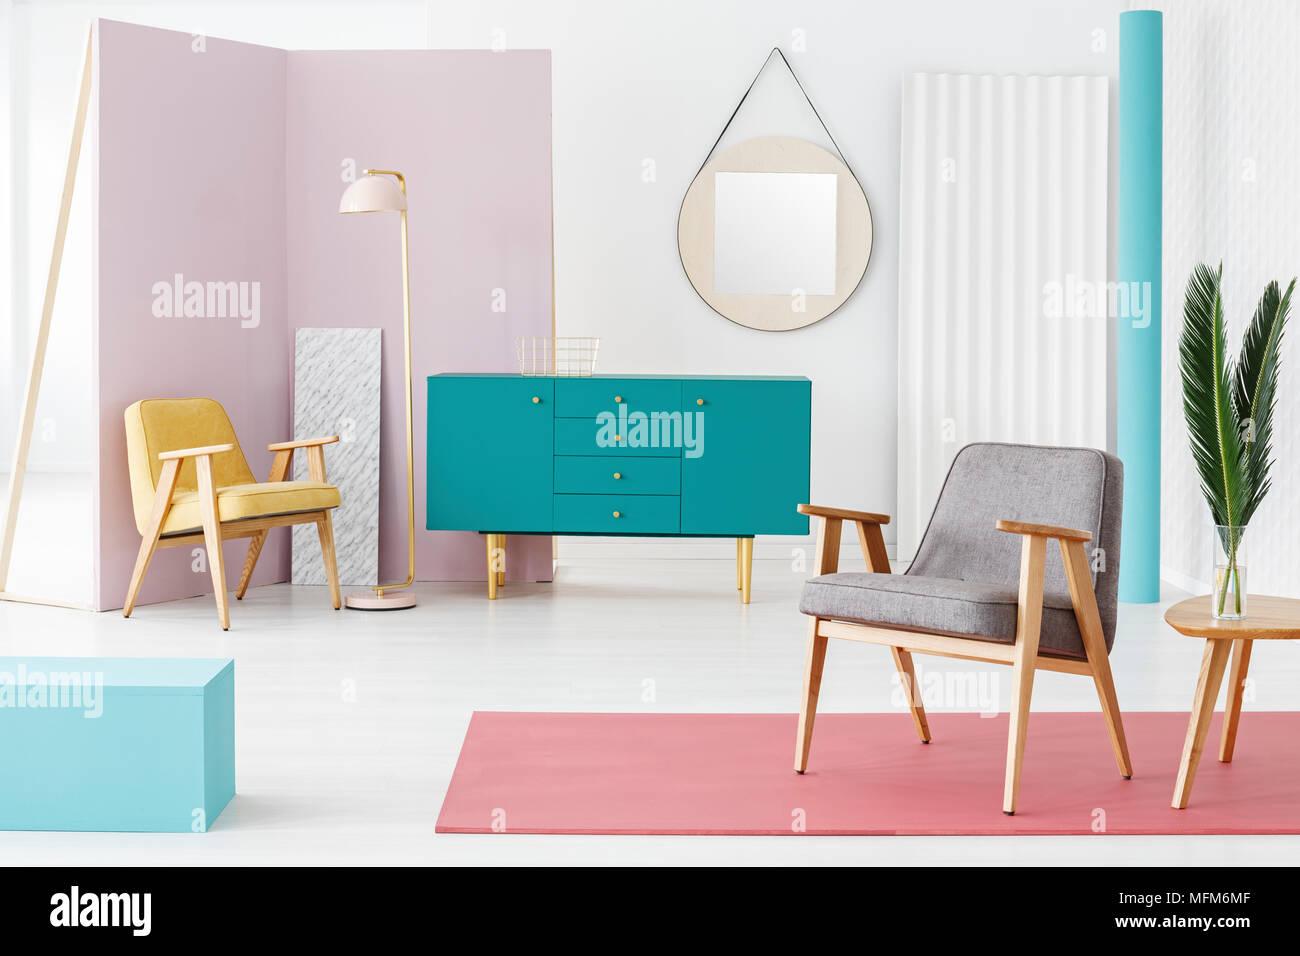 Creative Wooden Furniture Composition And Color Scheme Idea